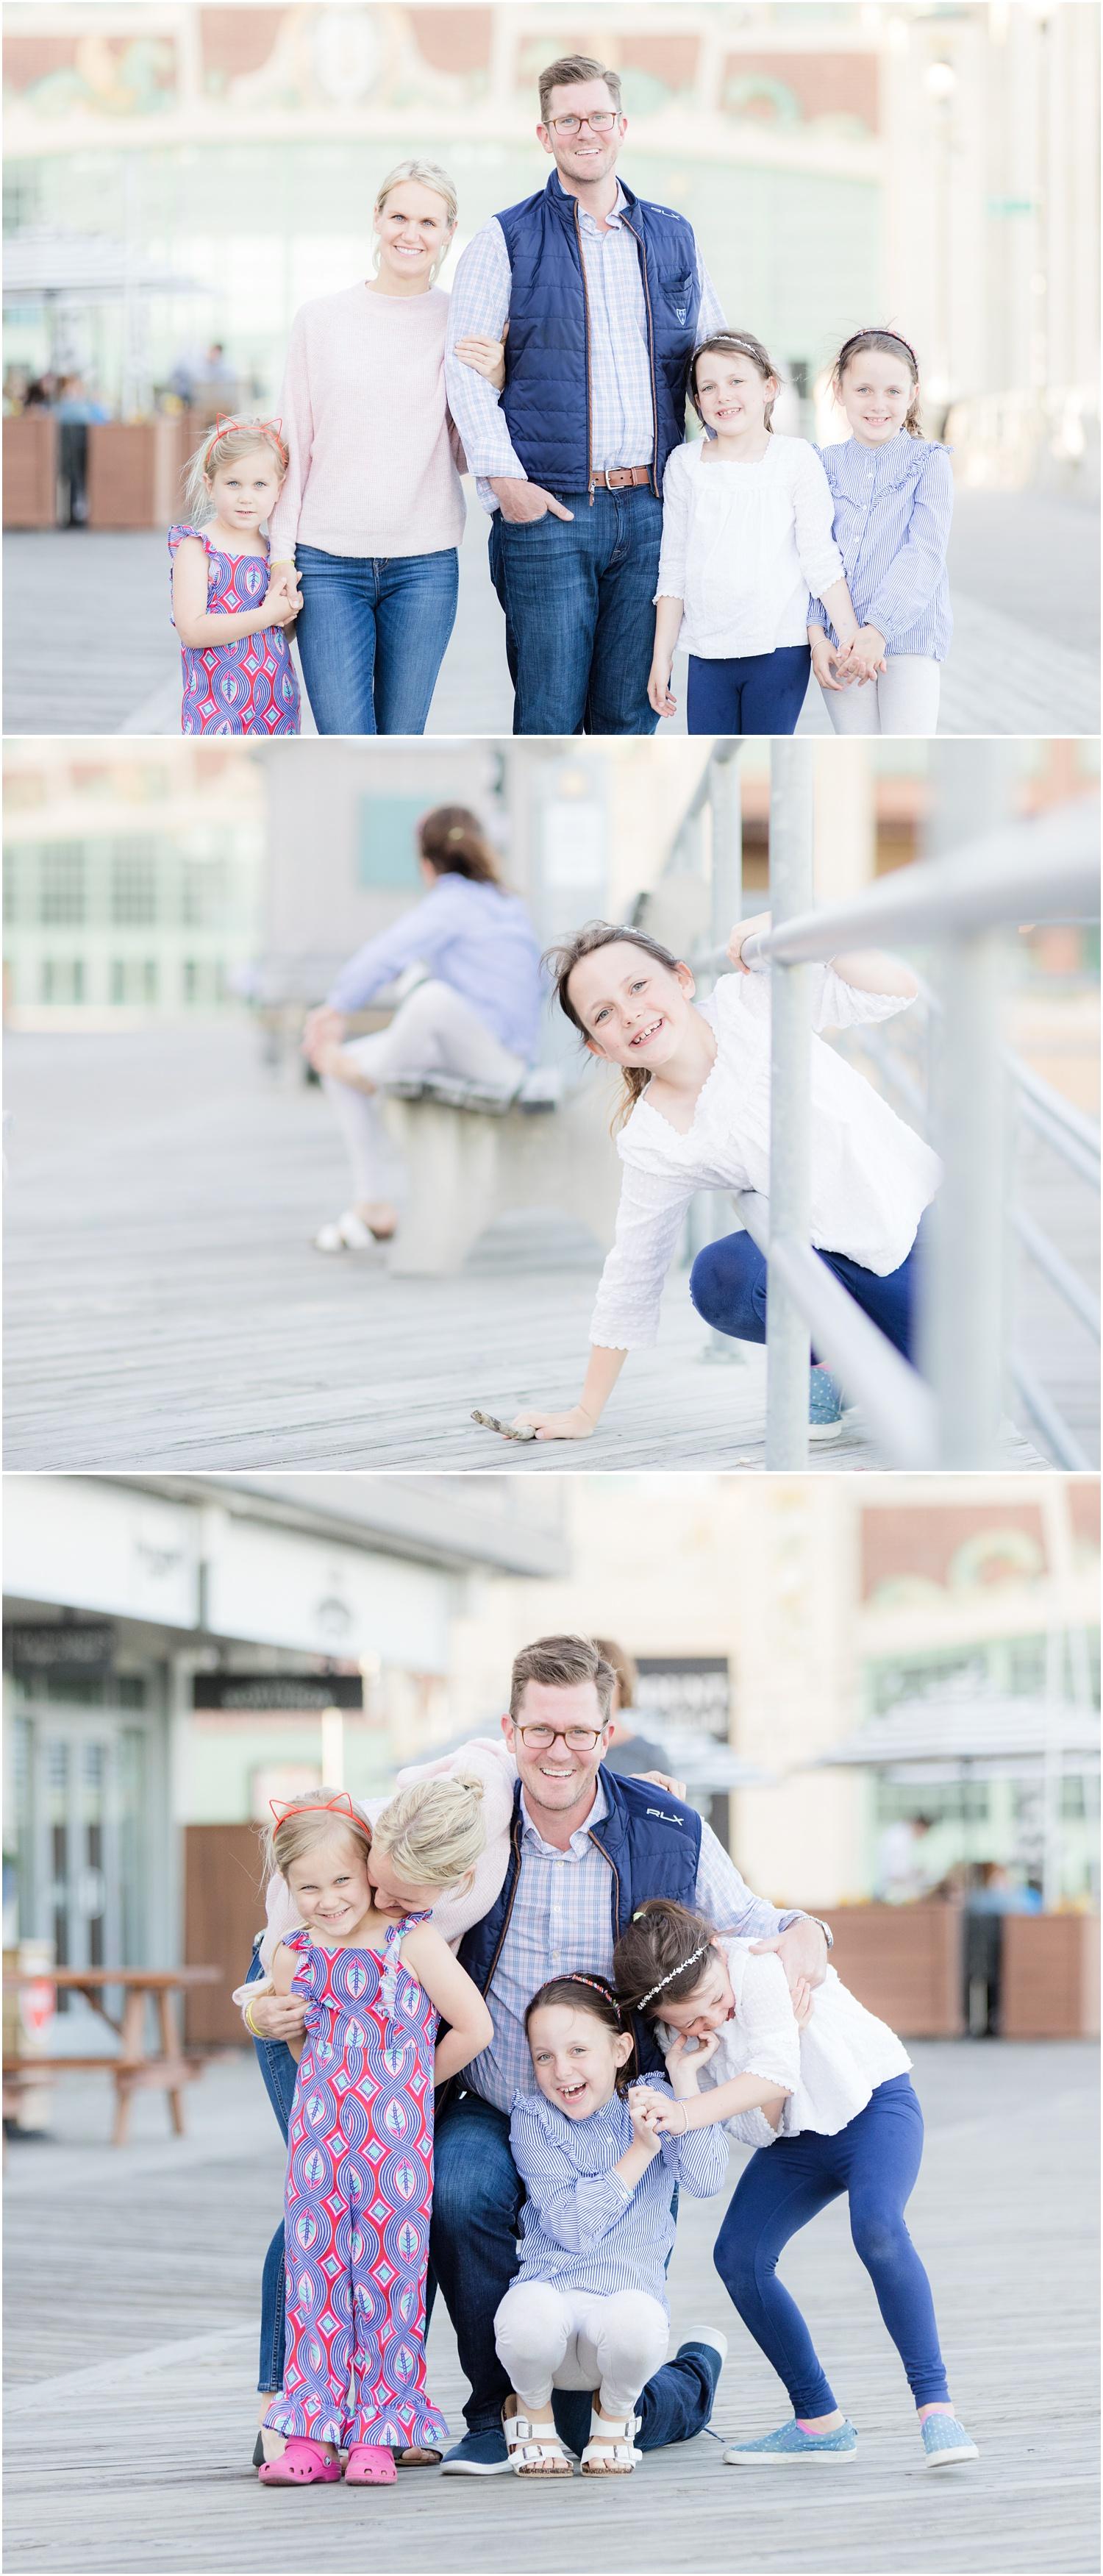 fun casual family photos on the boardwalk in Asbury Park.